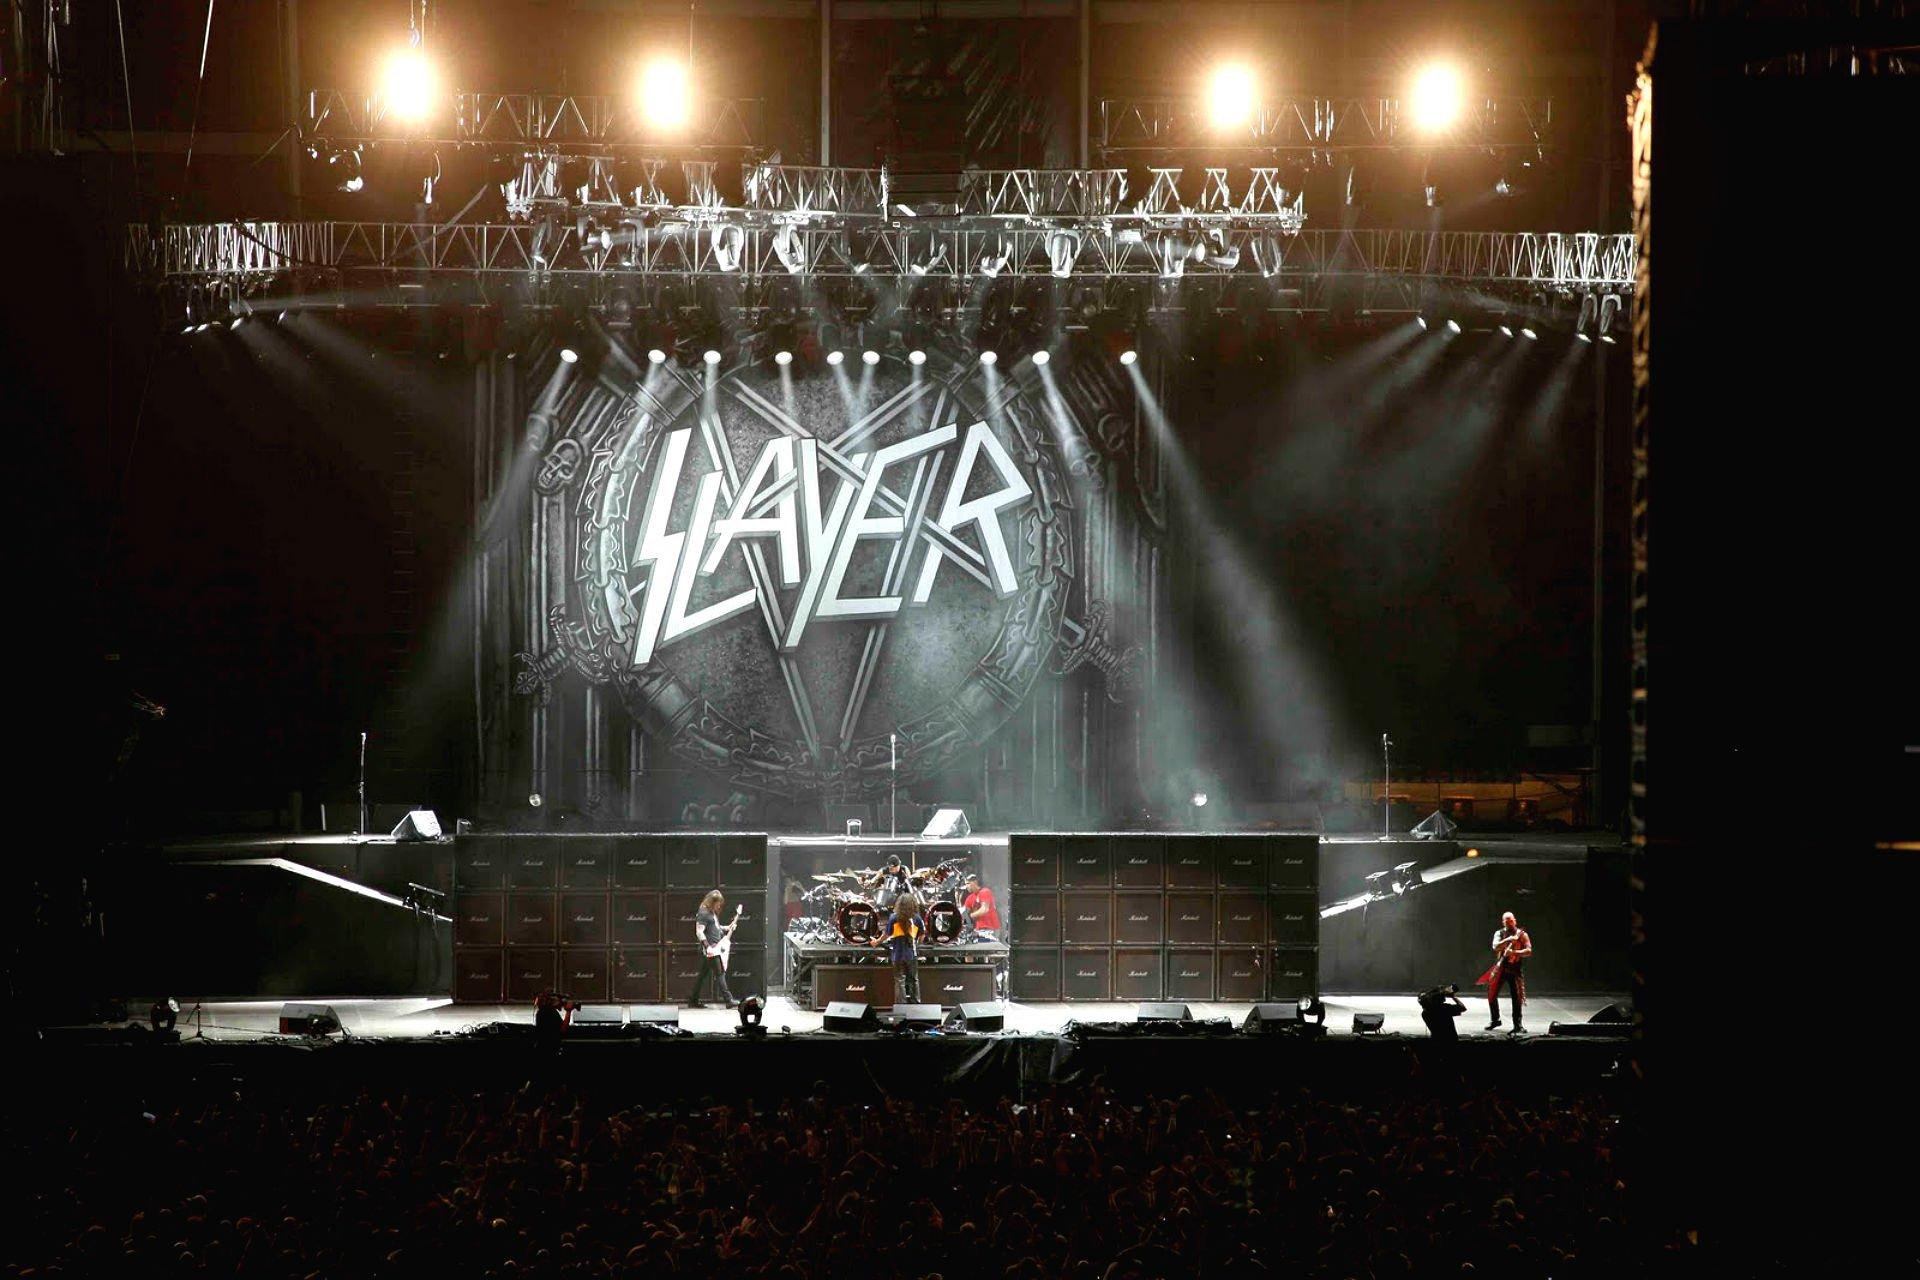 SLAYER death metal heavy thrash concert wallpaper 1920x1280 426963 1920x1280